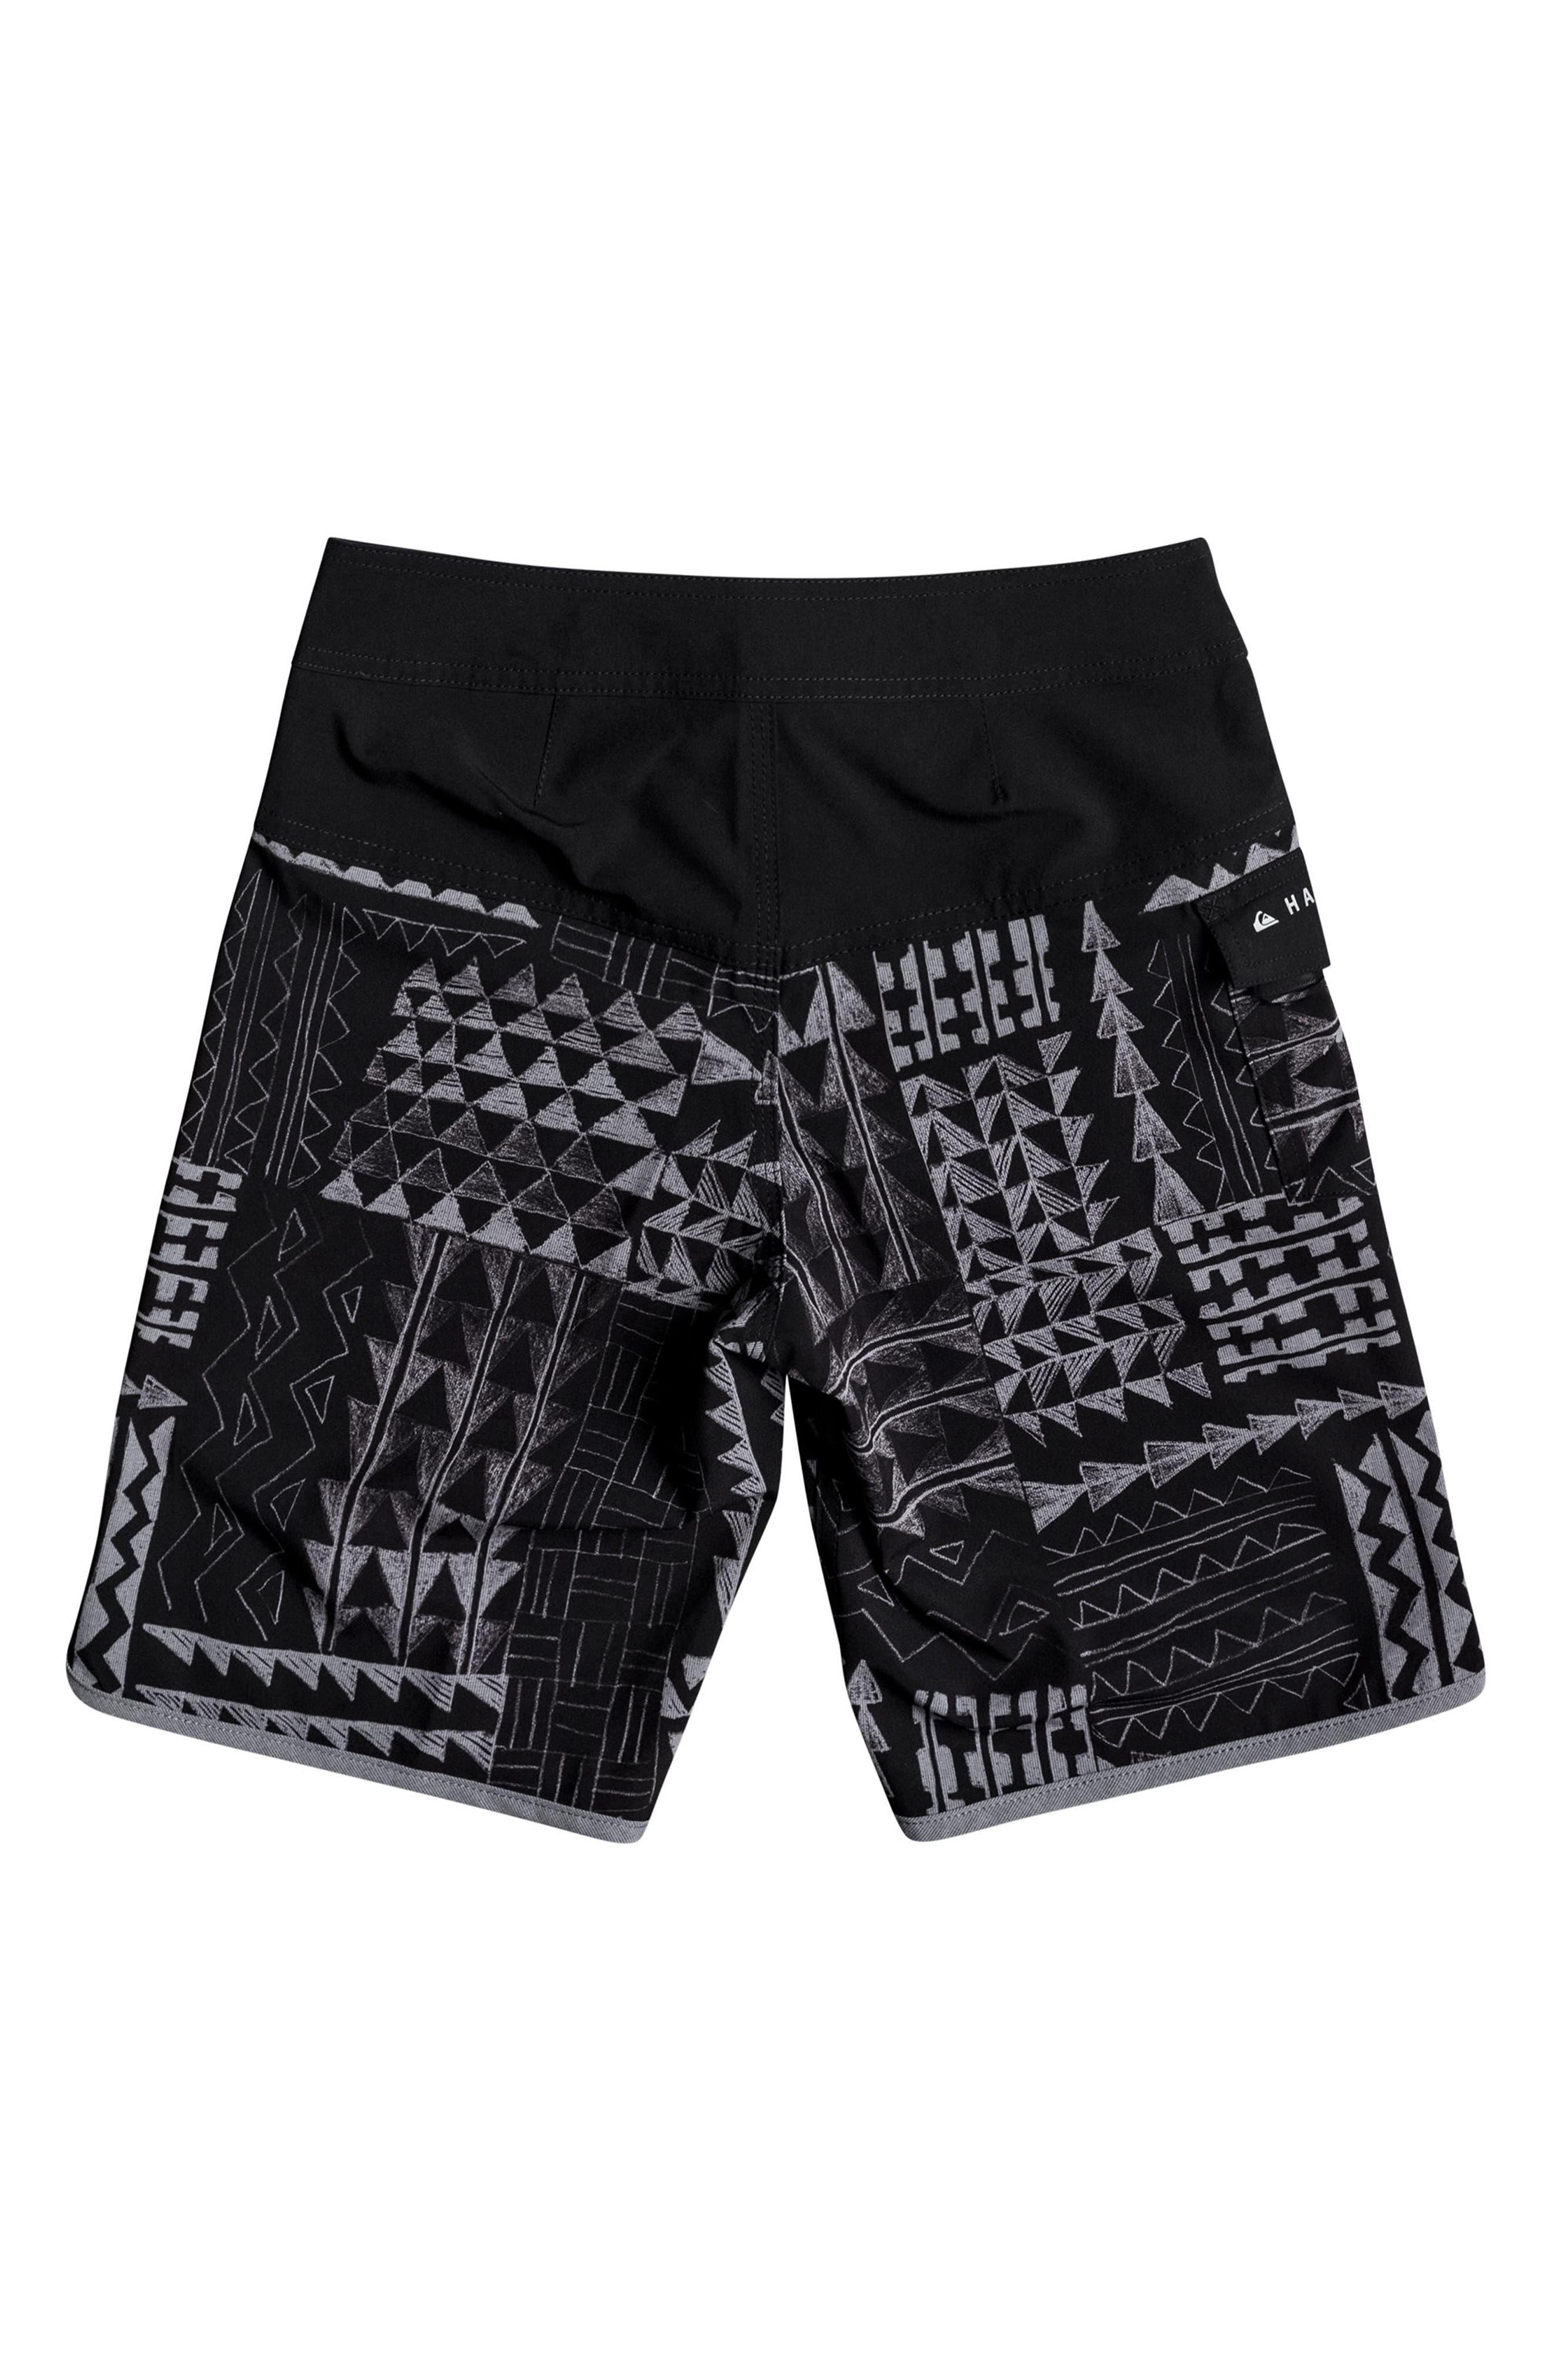 Alternate Image 2  - Quiksilver Hawaii Scallop Board Shorts (Big Boys)